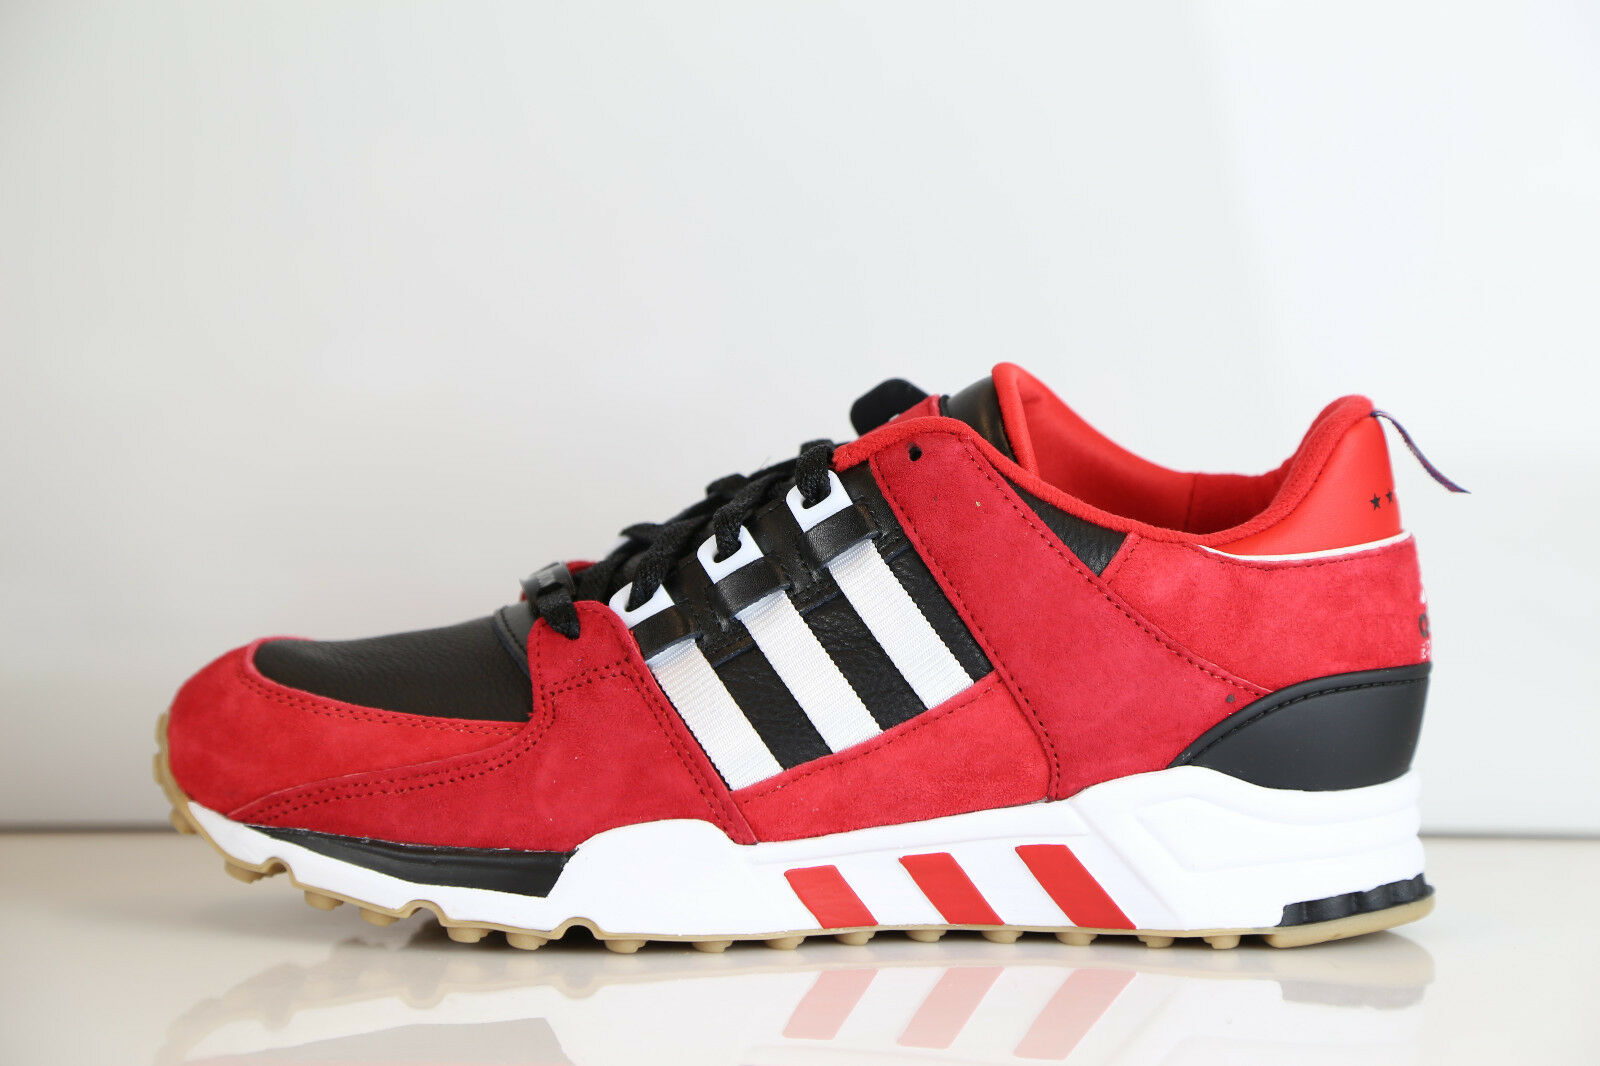 Adidas Equipment Running Running Running Support EQT 93 London rosso B27660 9-12 boost og tubular e0f222